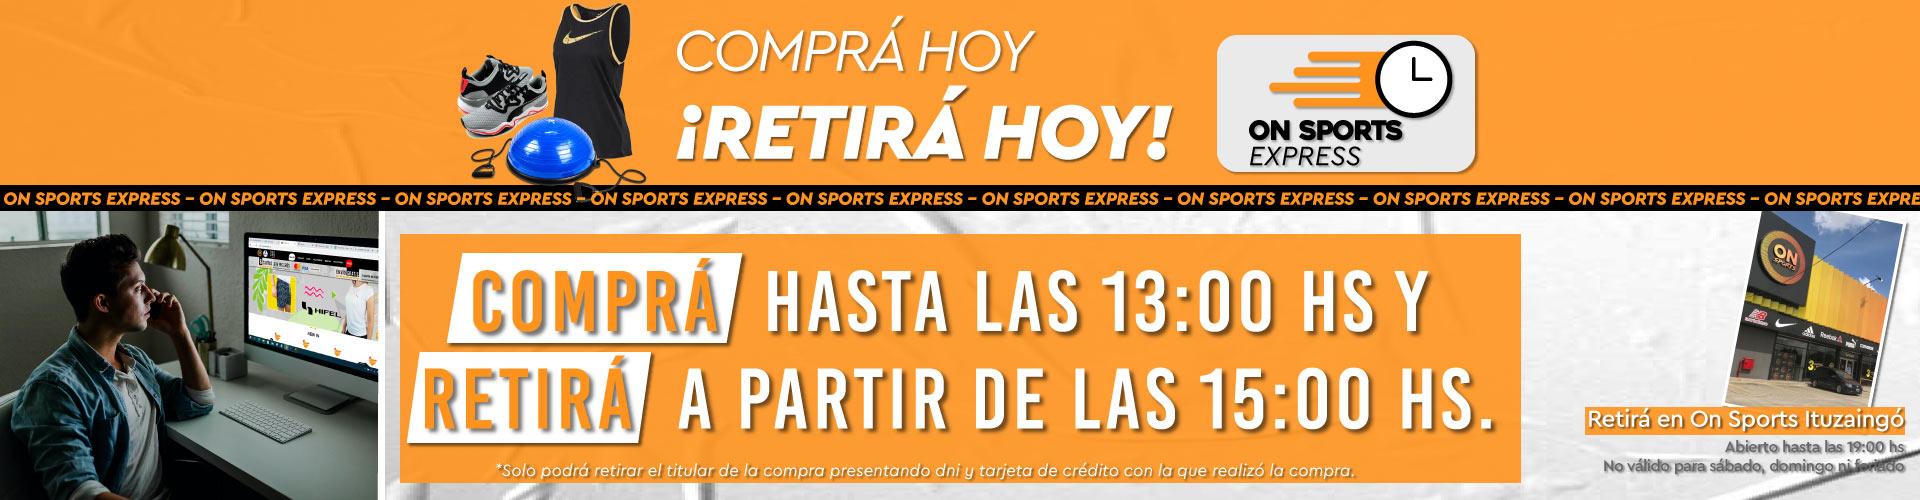 Retiro express DT